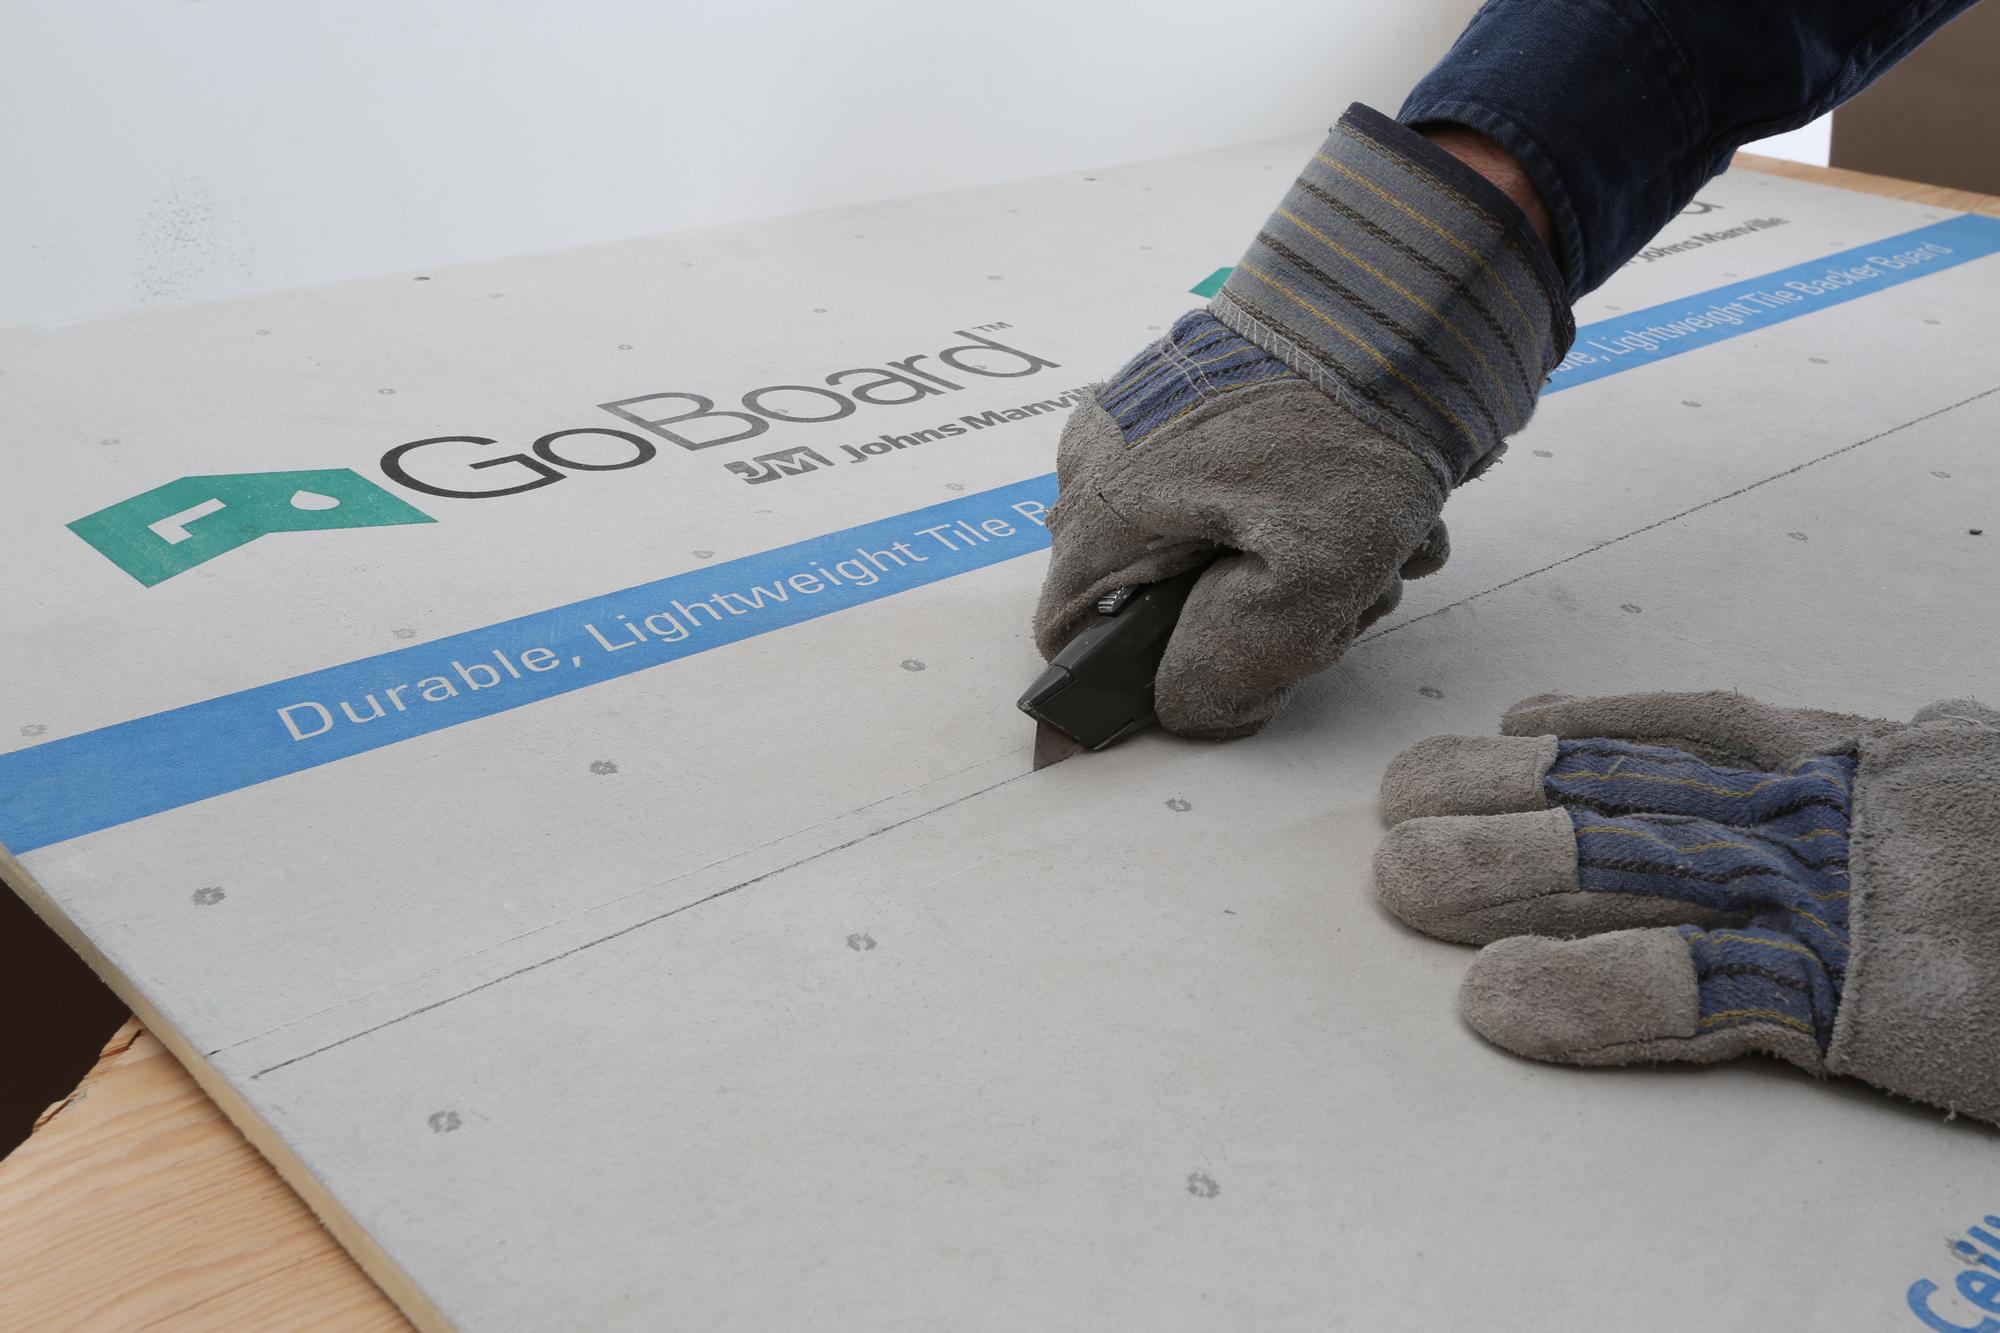 Lightweight tile backer jlc online moisture barriers tile lightweight tile backer jlc online moisture barriers tile walls shower bath kitchen johns manville dailygadgetfo Images